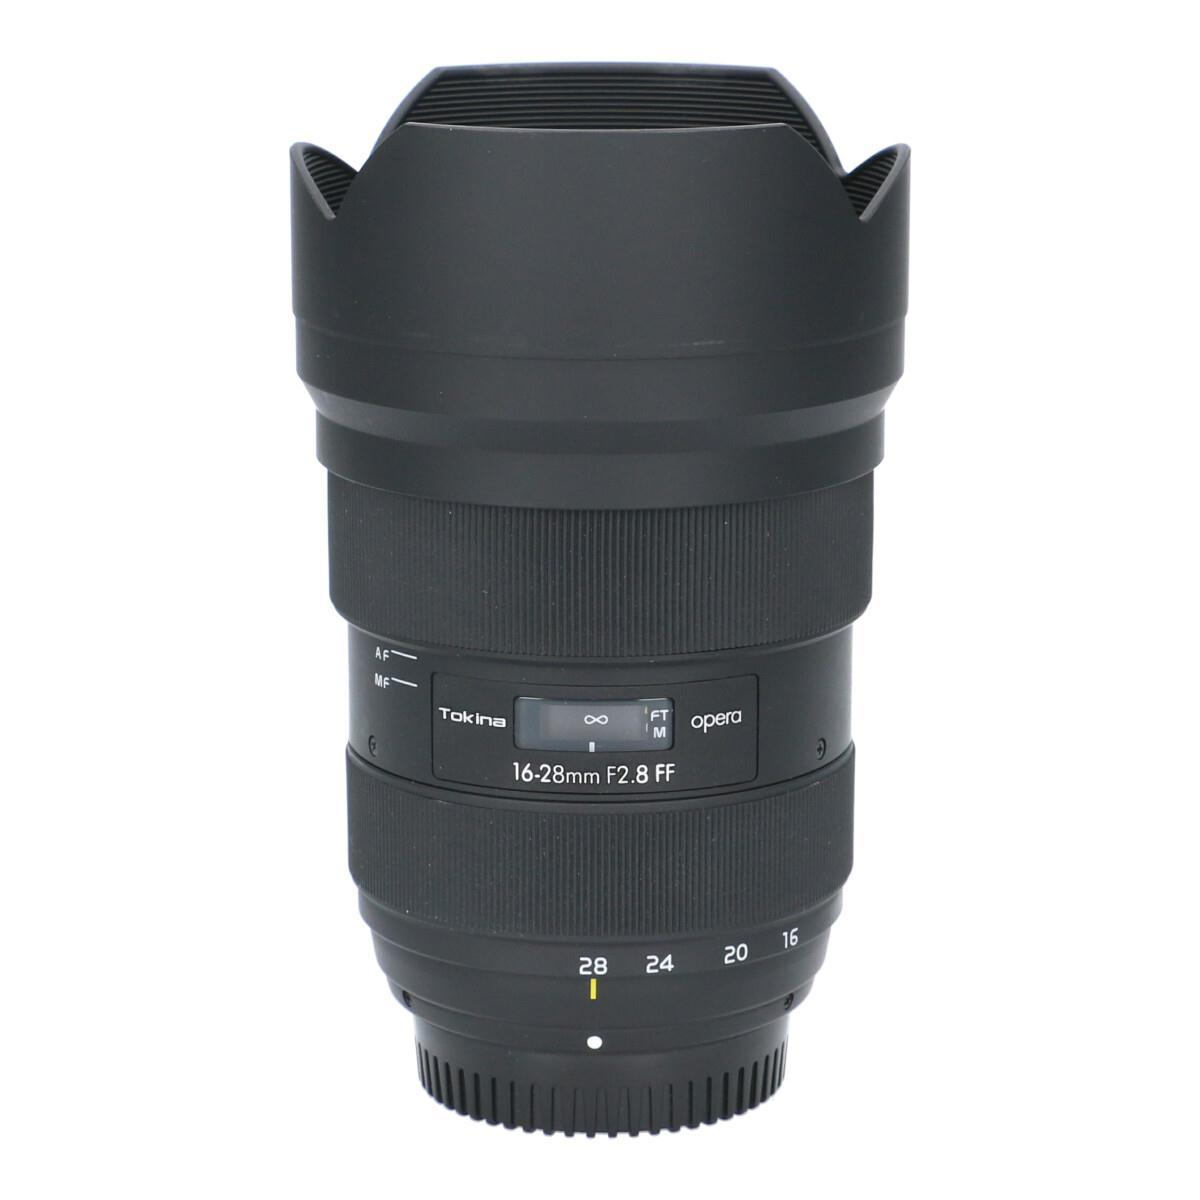 TOKINA ニコン16-28mm F2.8FF【中古】